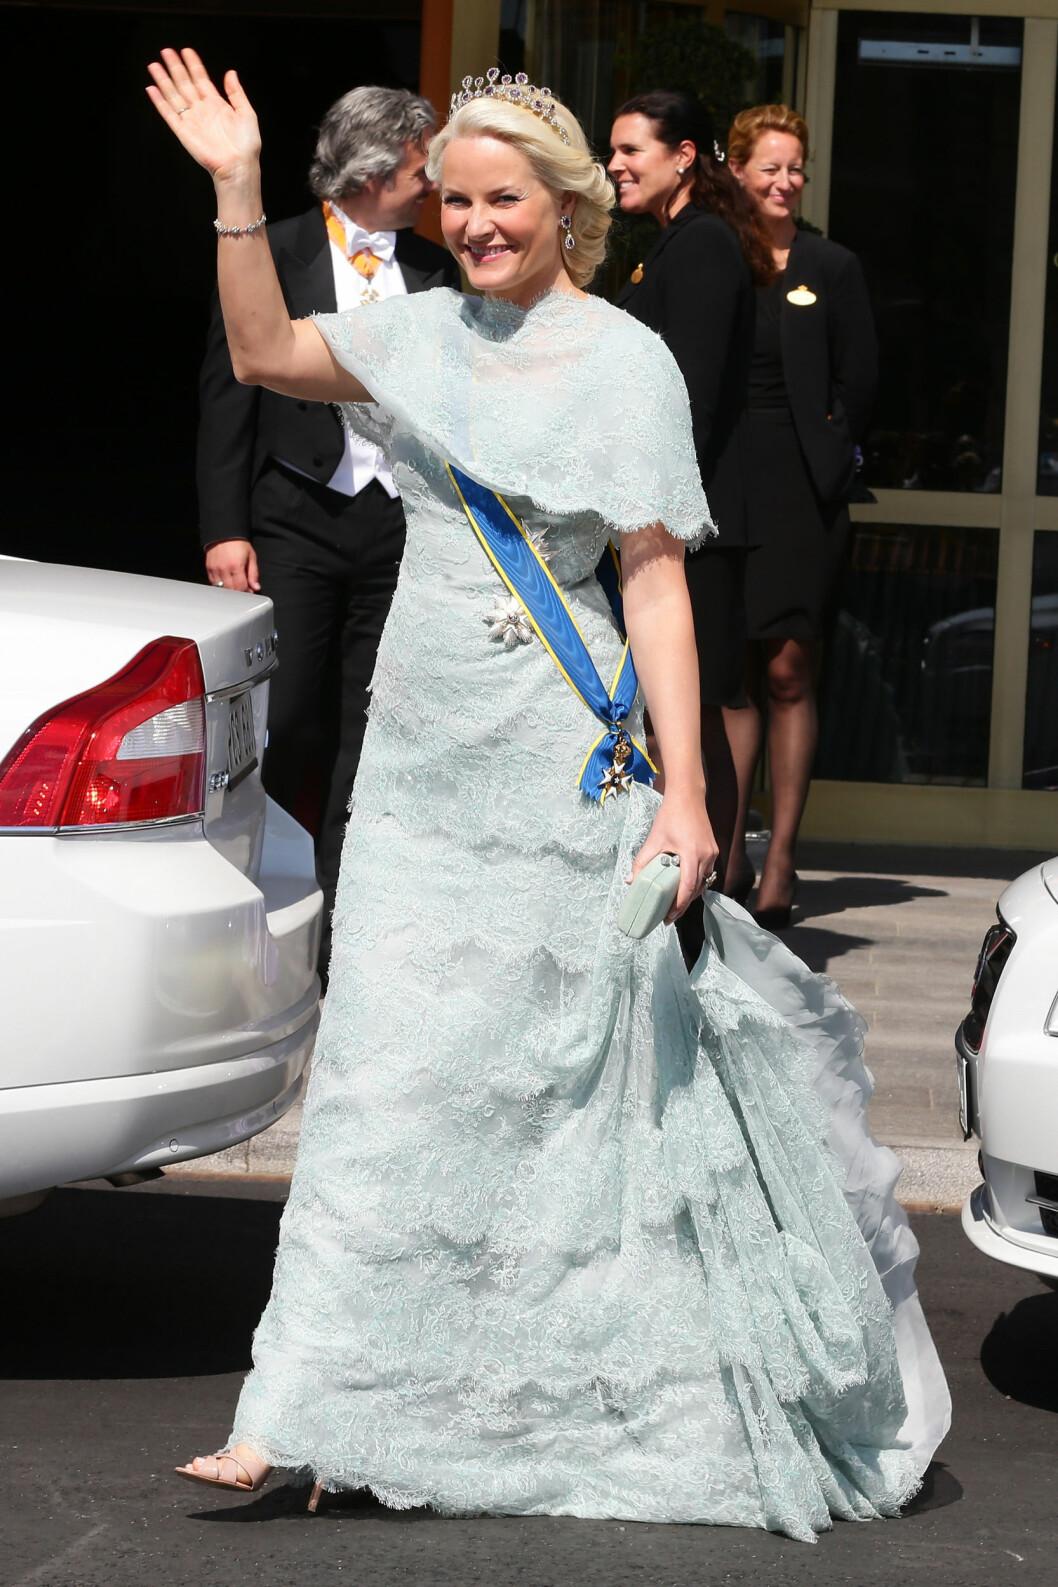 <strong>ISBLÅ:</strong>Kronprinsessen hadde valgt en isblå lang kjole med blonder og cape til bryllupet.  Foto: All Over Press